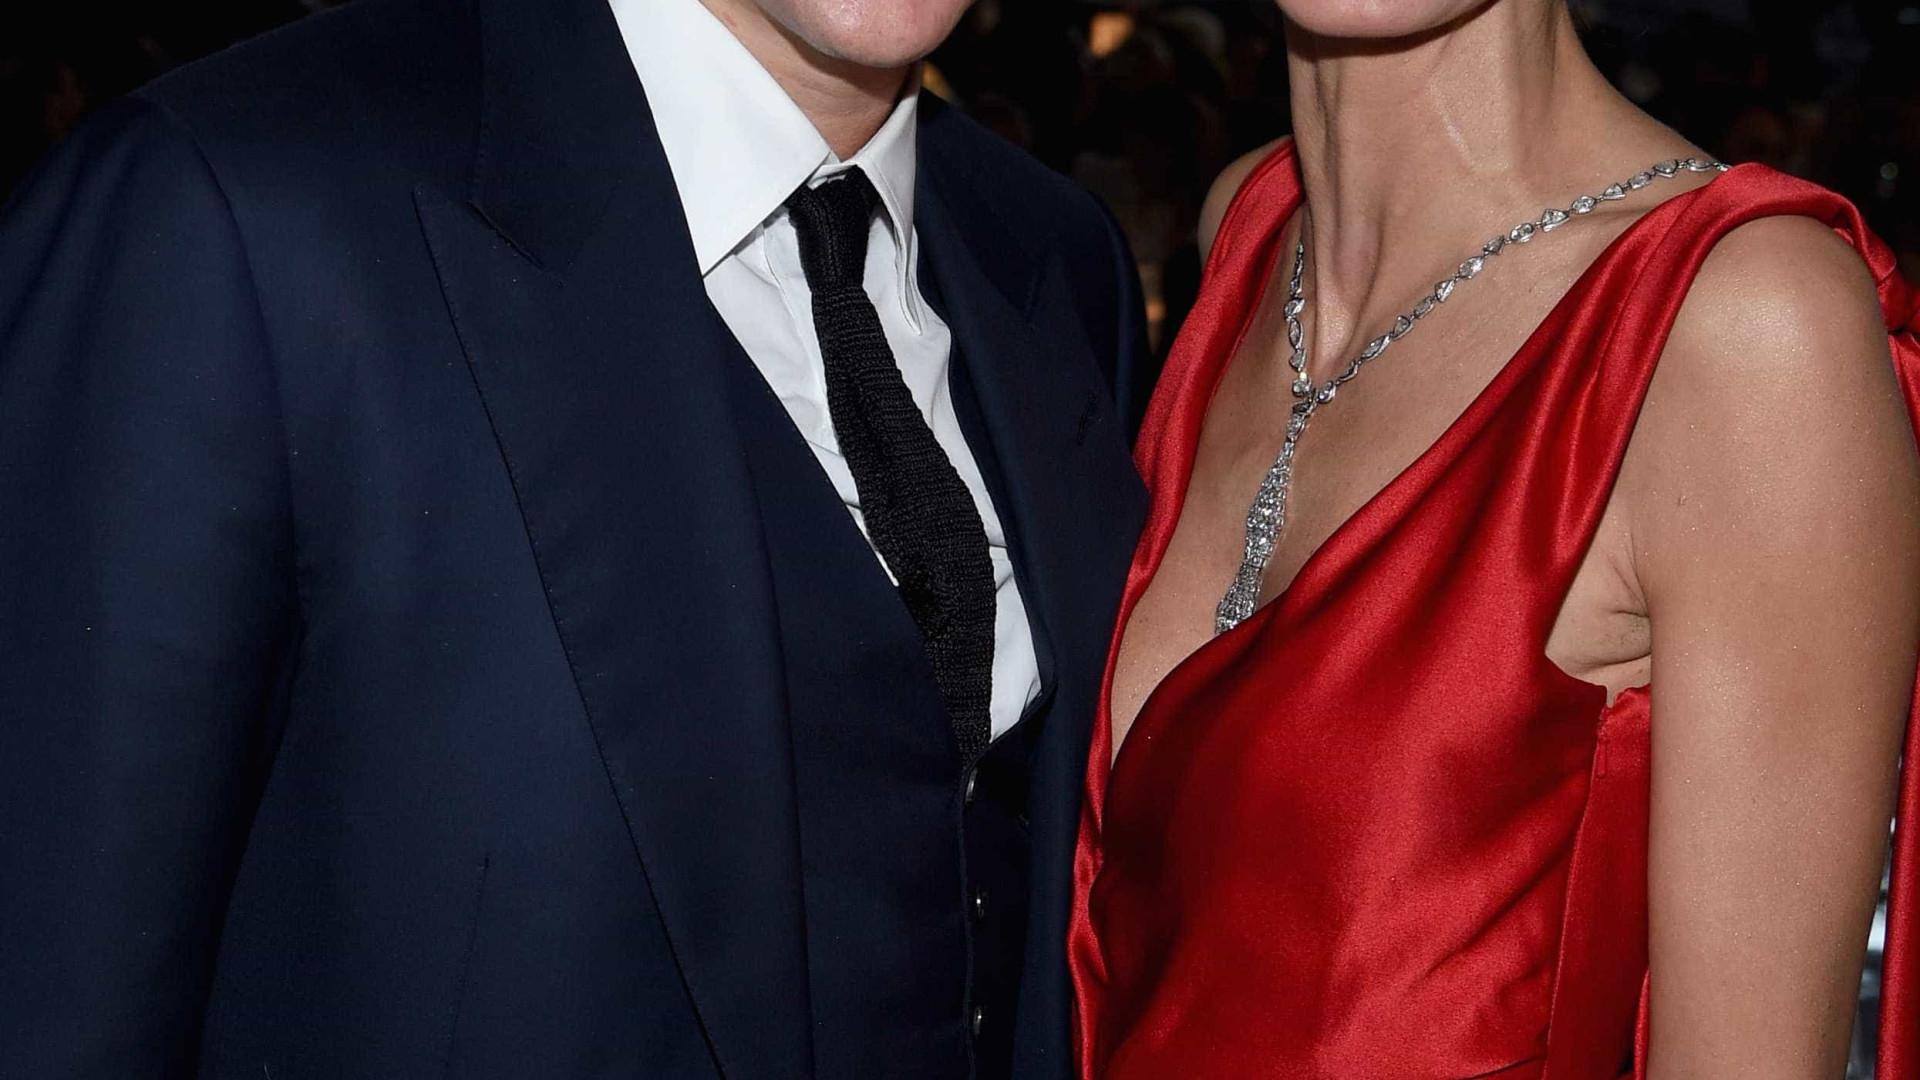 Heidi Klum e Vito Schnabel 'deram um tempo'